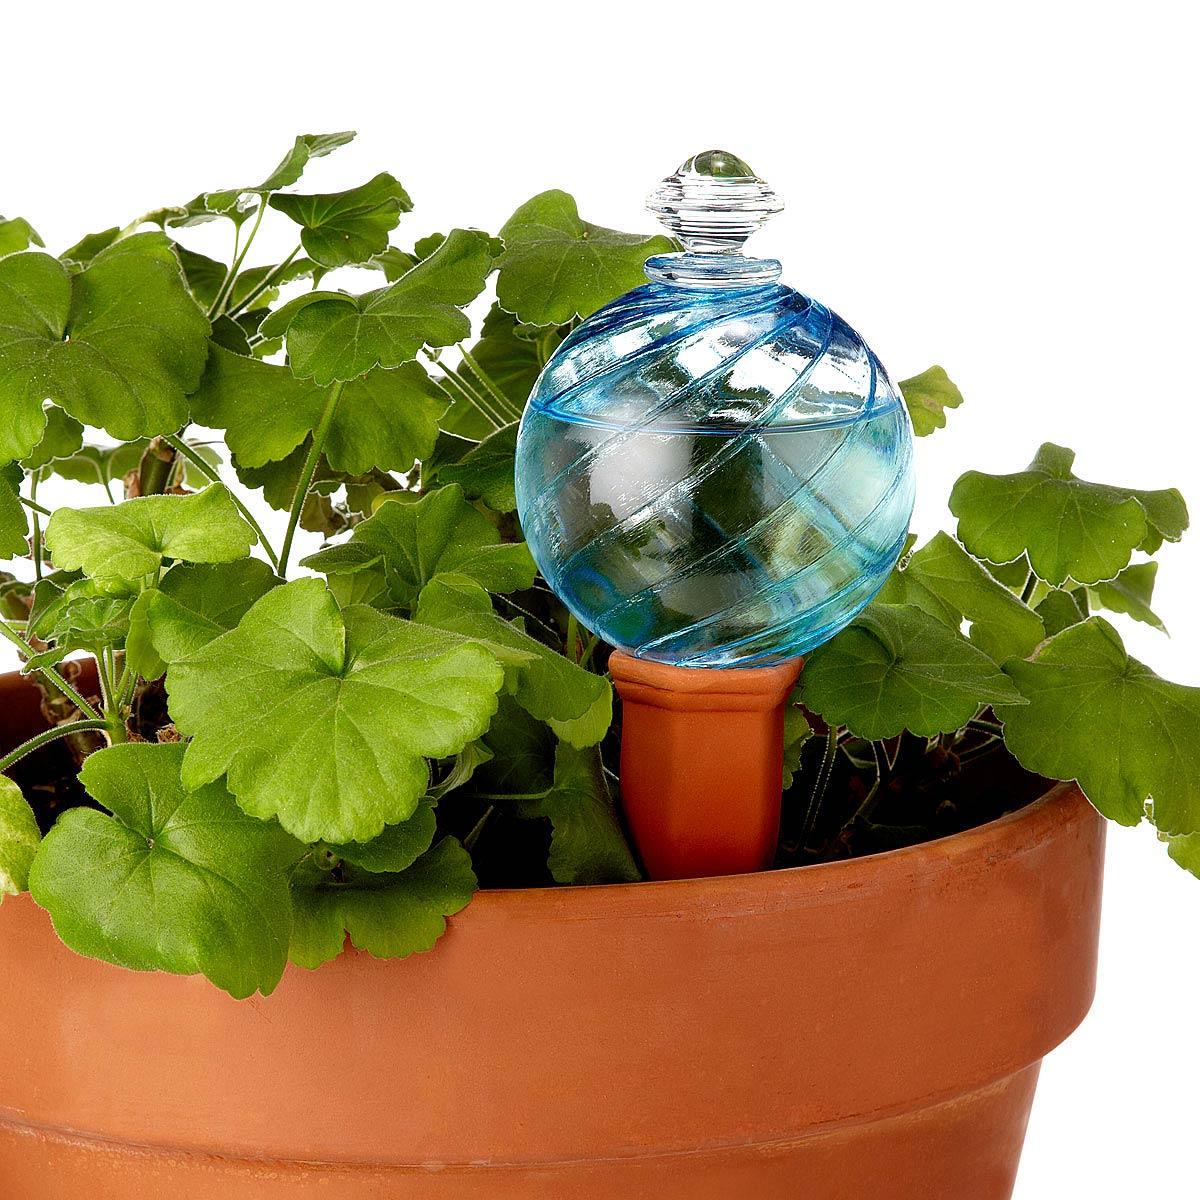 self watering planter easy garden low maintenance uncommongoods